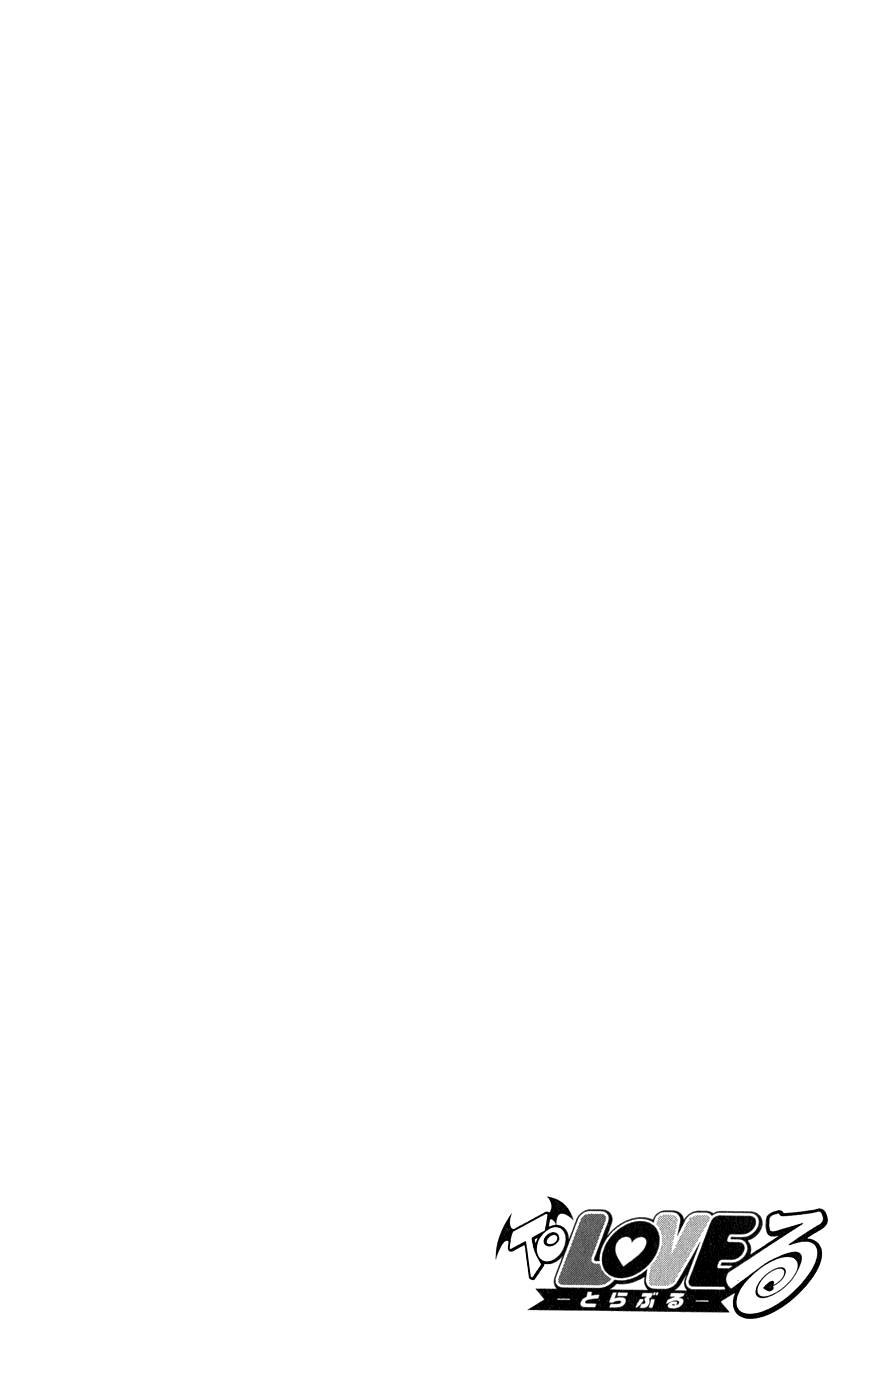 Манга Любовные неприятности / To Love-Ru  - Том 7 Глава 59 Страница 20